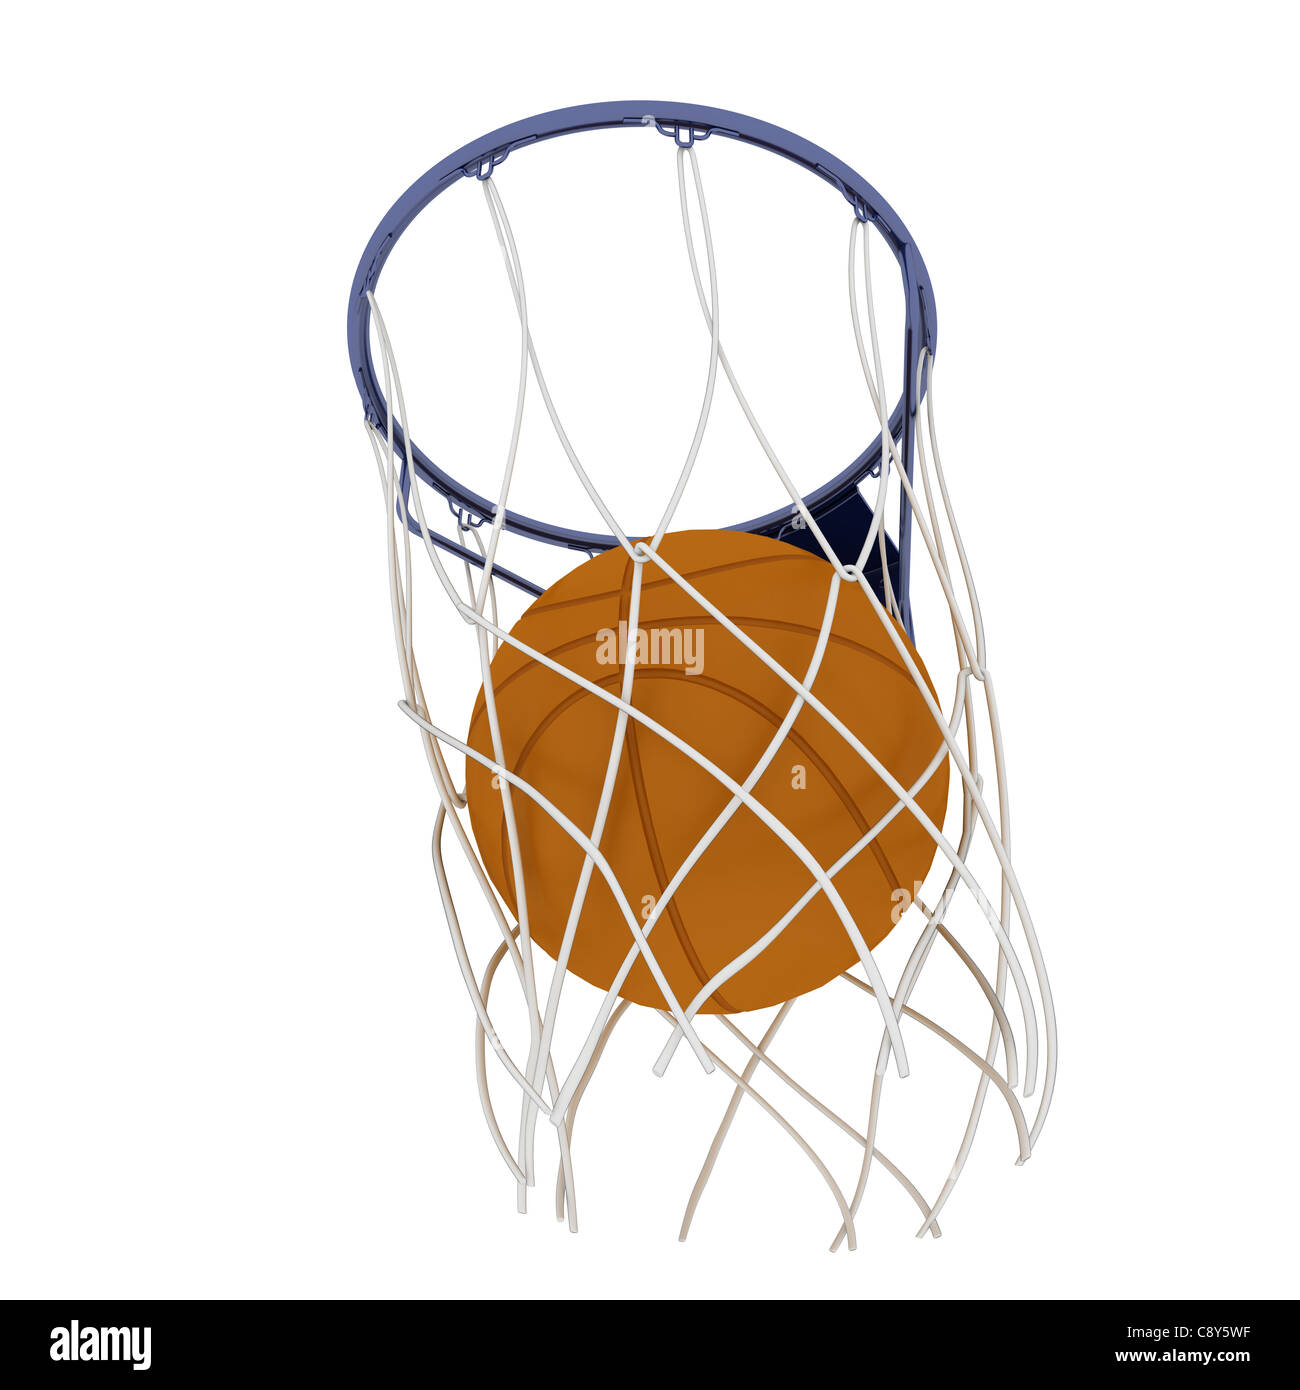 Two basketball items - Stock Image